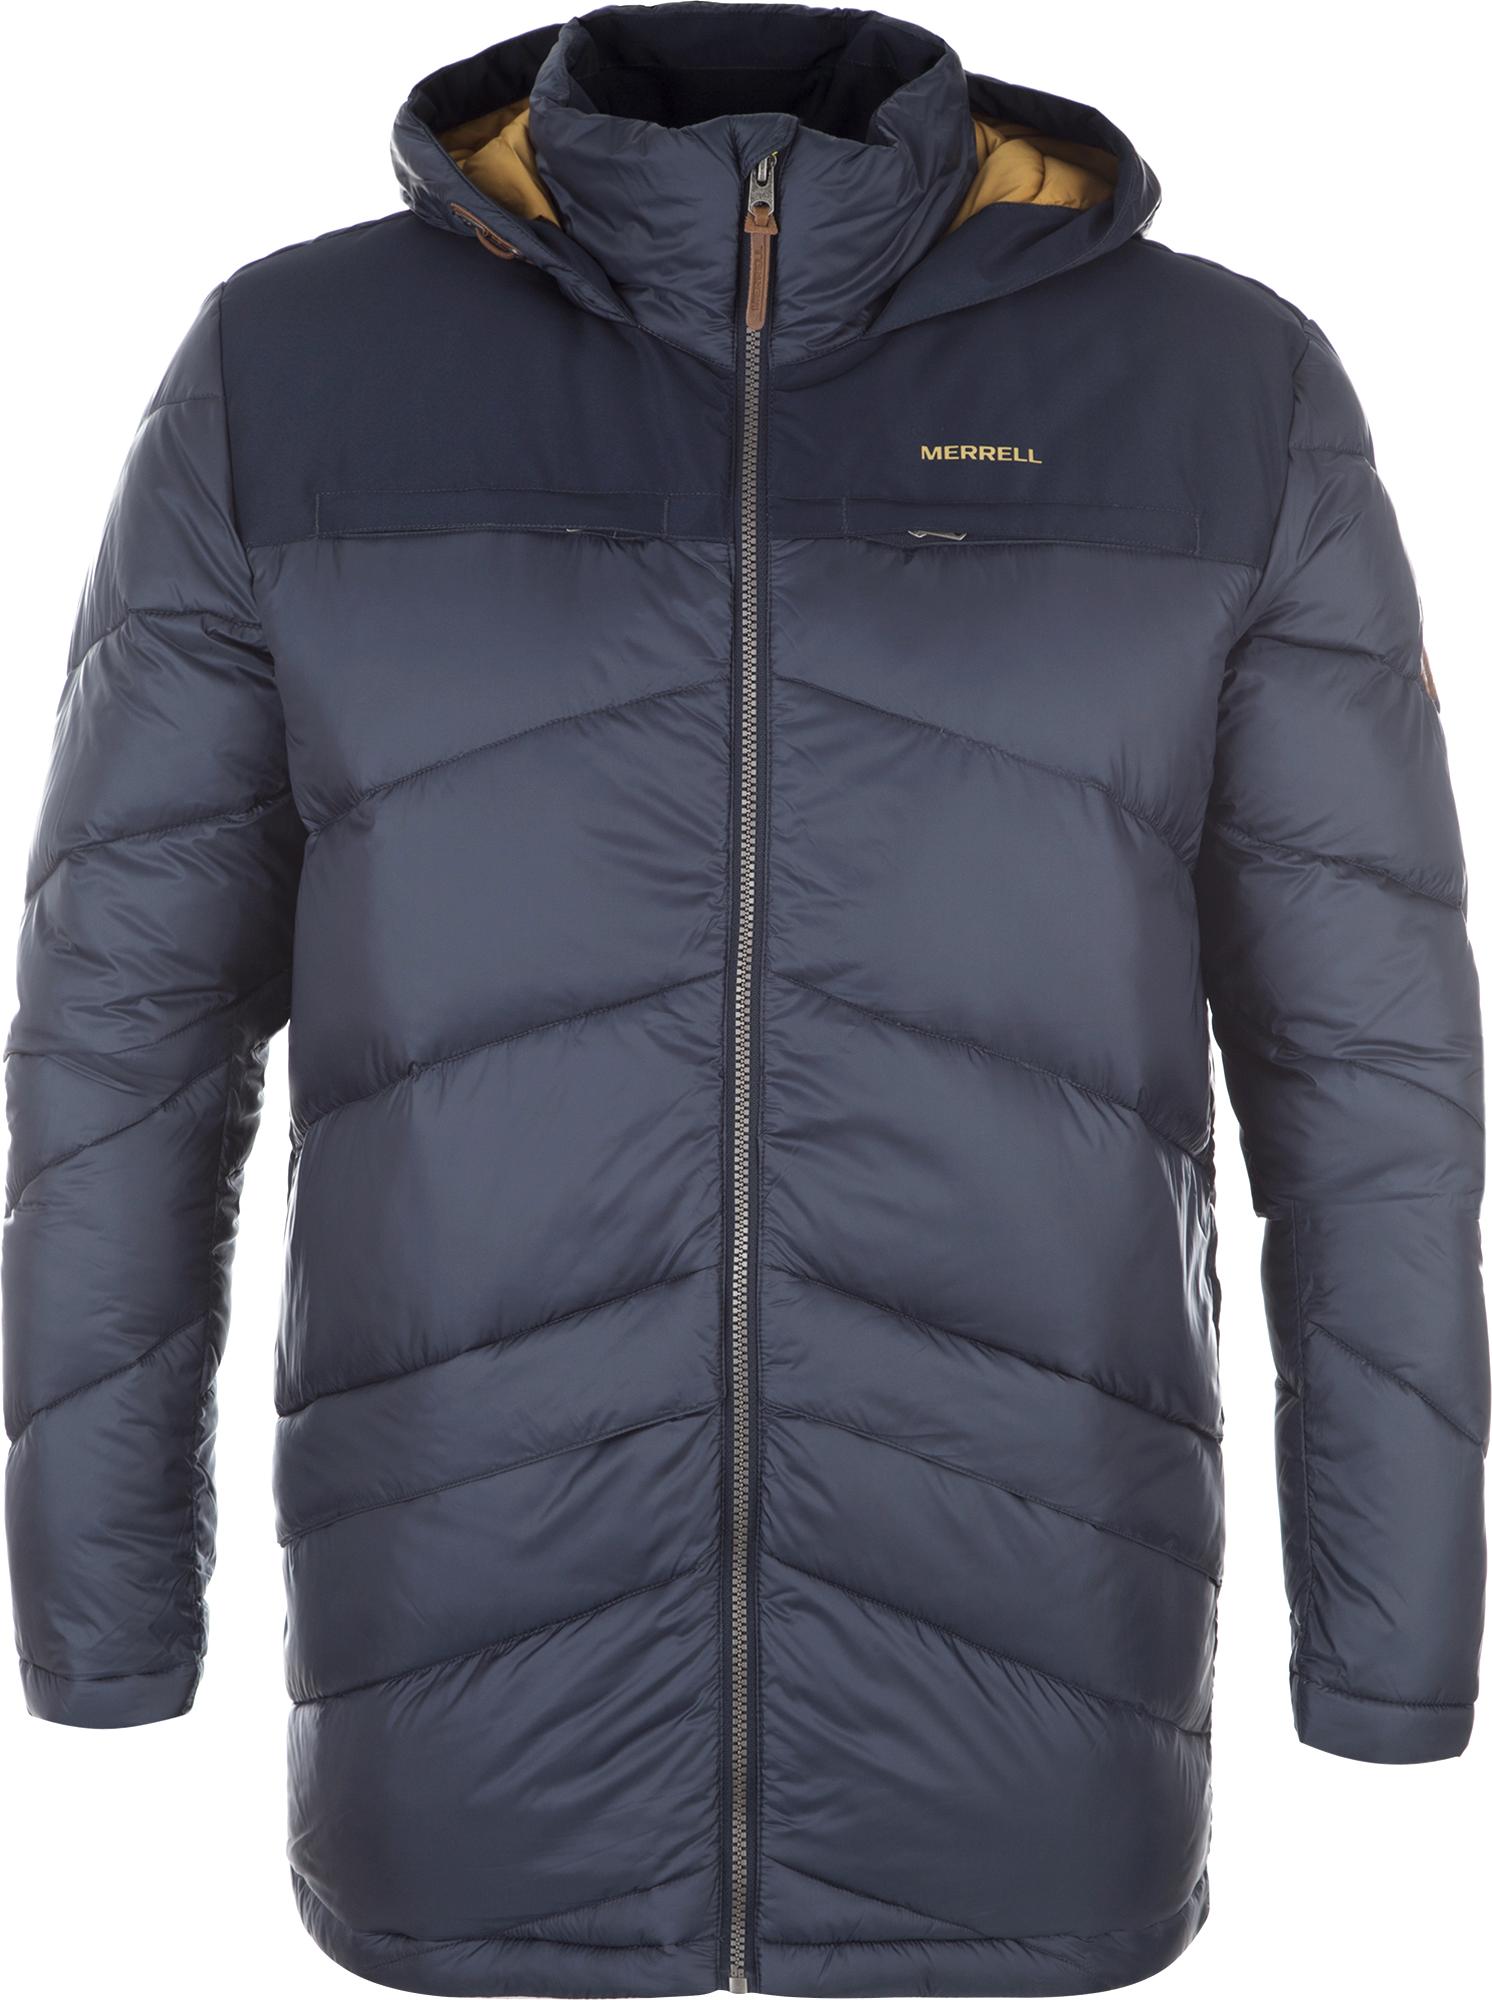 Merrell Куртка пуховая мужская Merrell Britannia merrell куртка утепленная мужская merrell locus